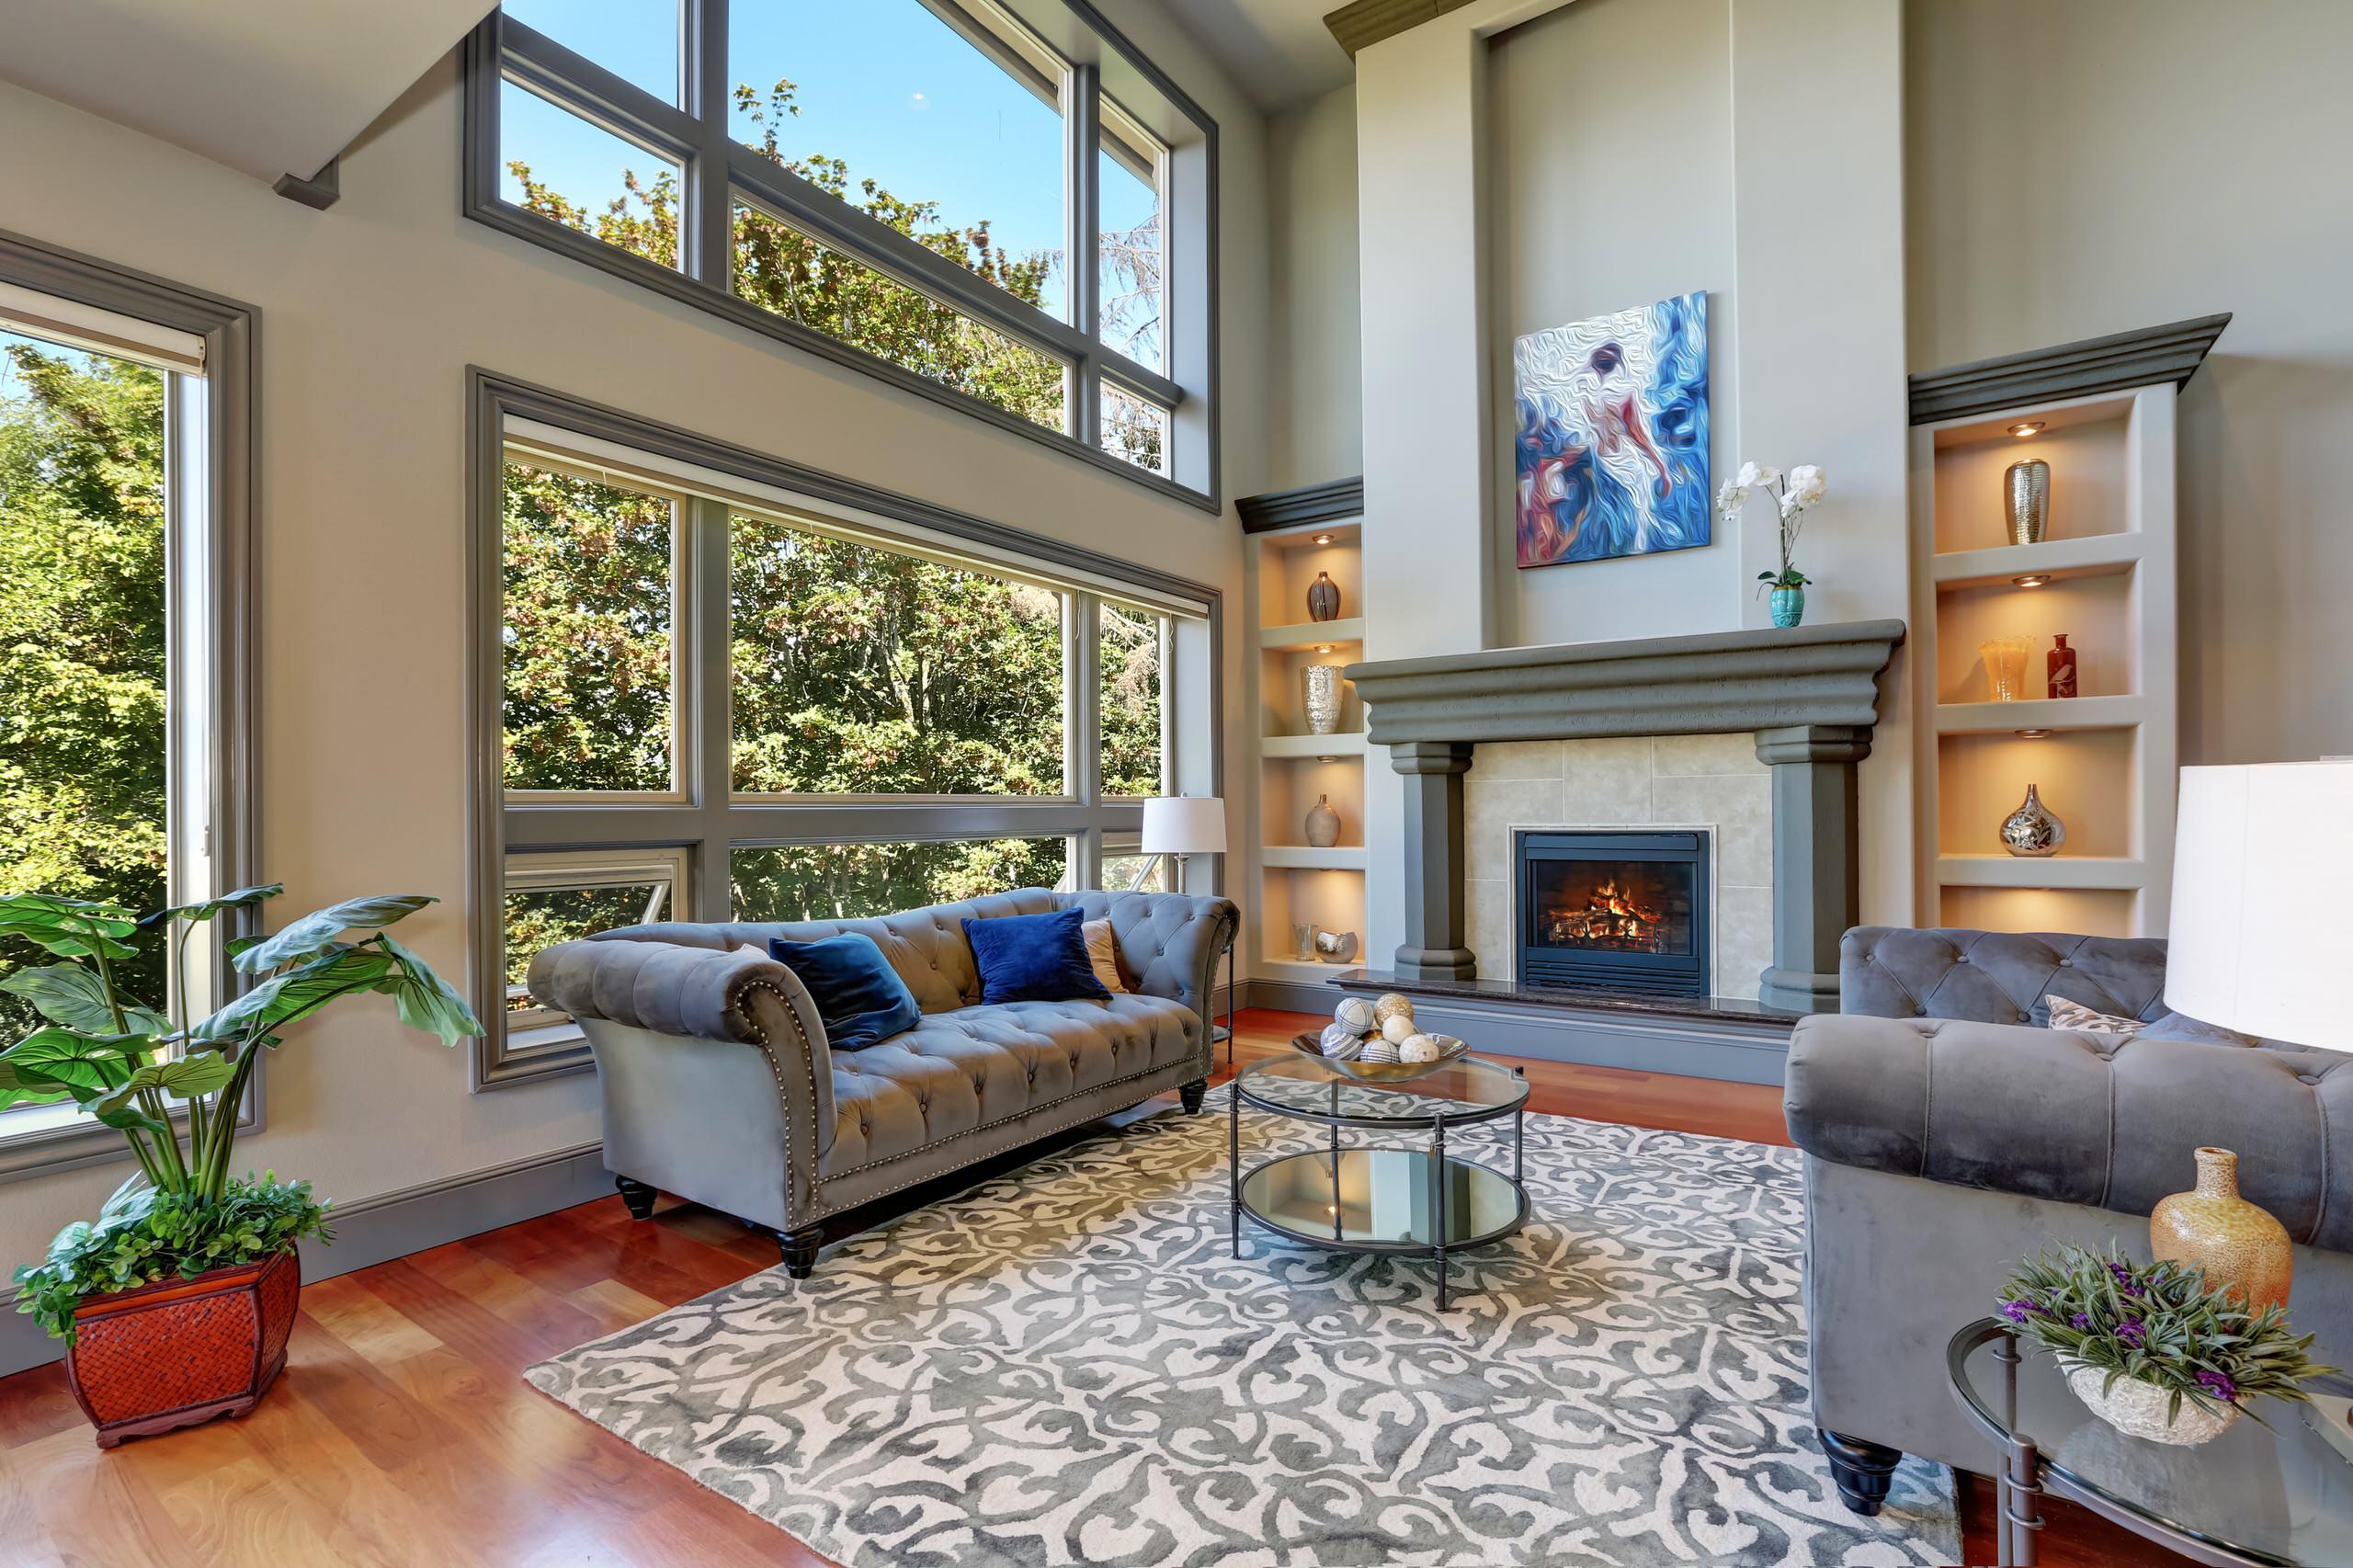 75 Beautiful Medium Tone Wood Floor Living Room Pictures Ideas February 2021 Houzz